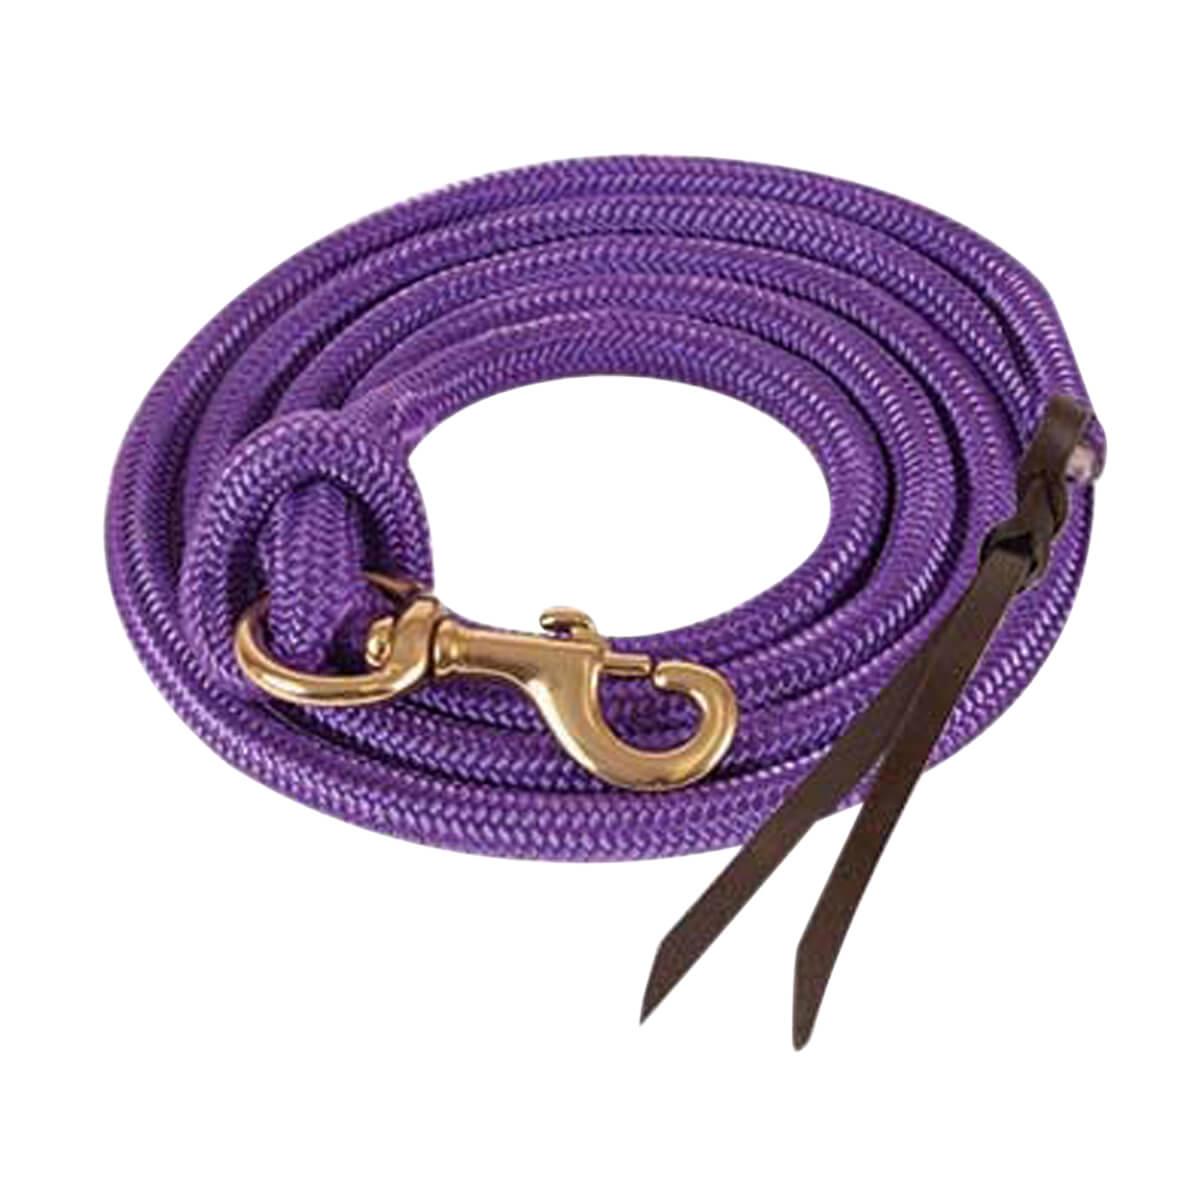 Mustang Cowboy Poly Lead Rope  - Purple - 22